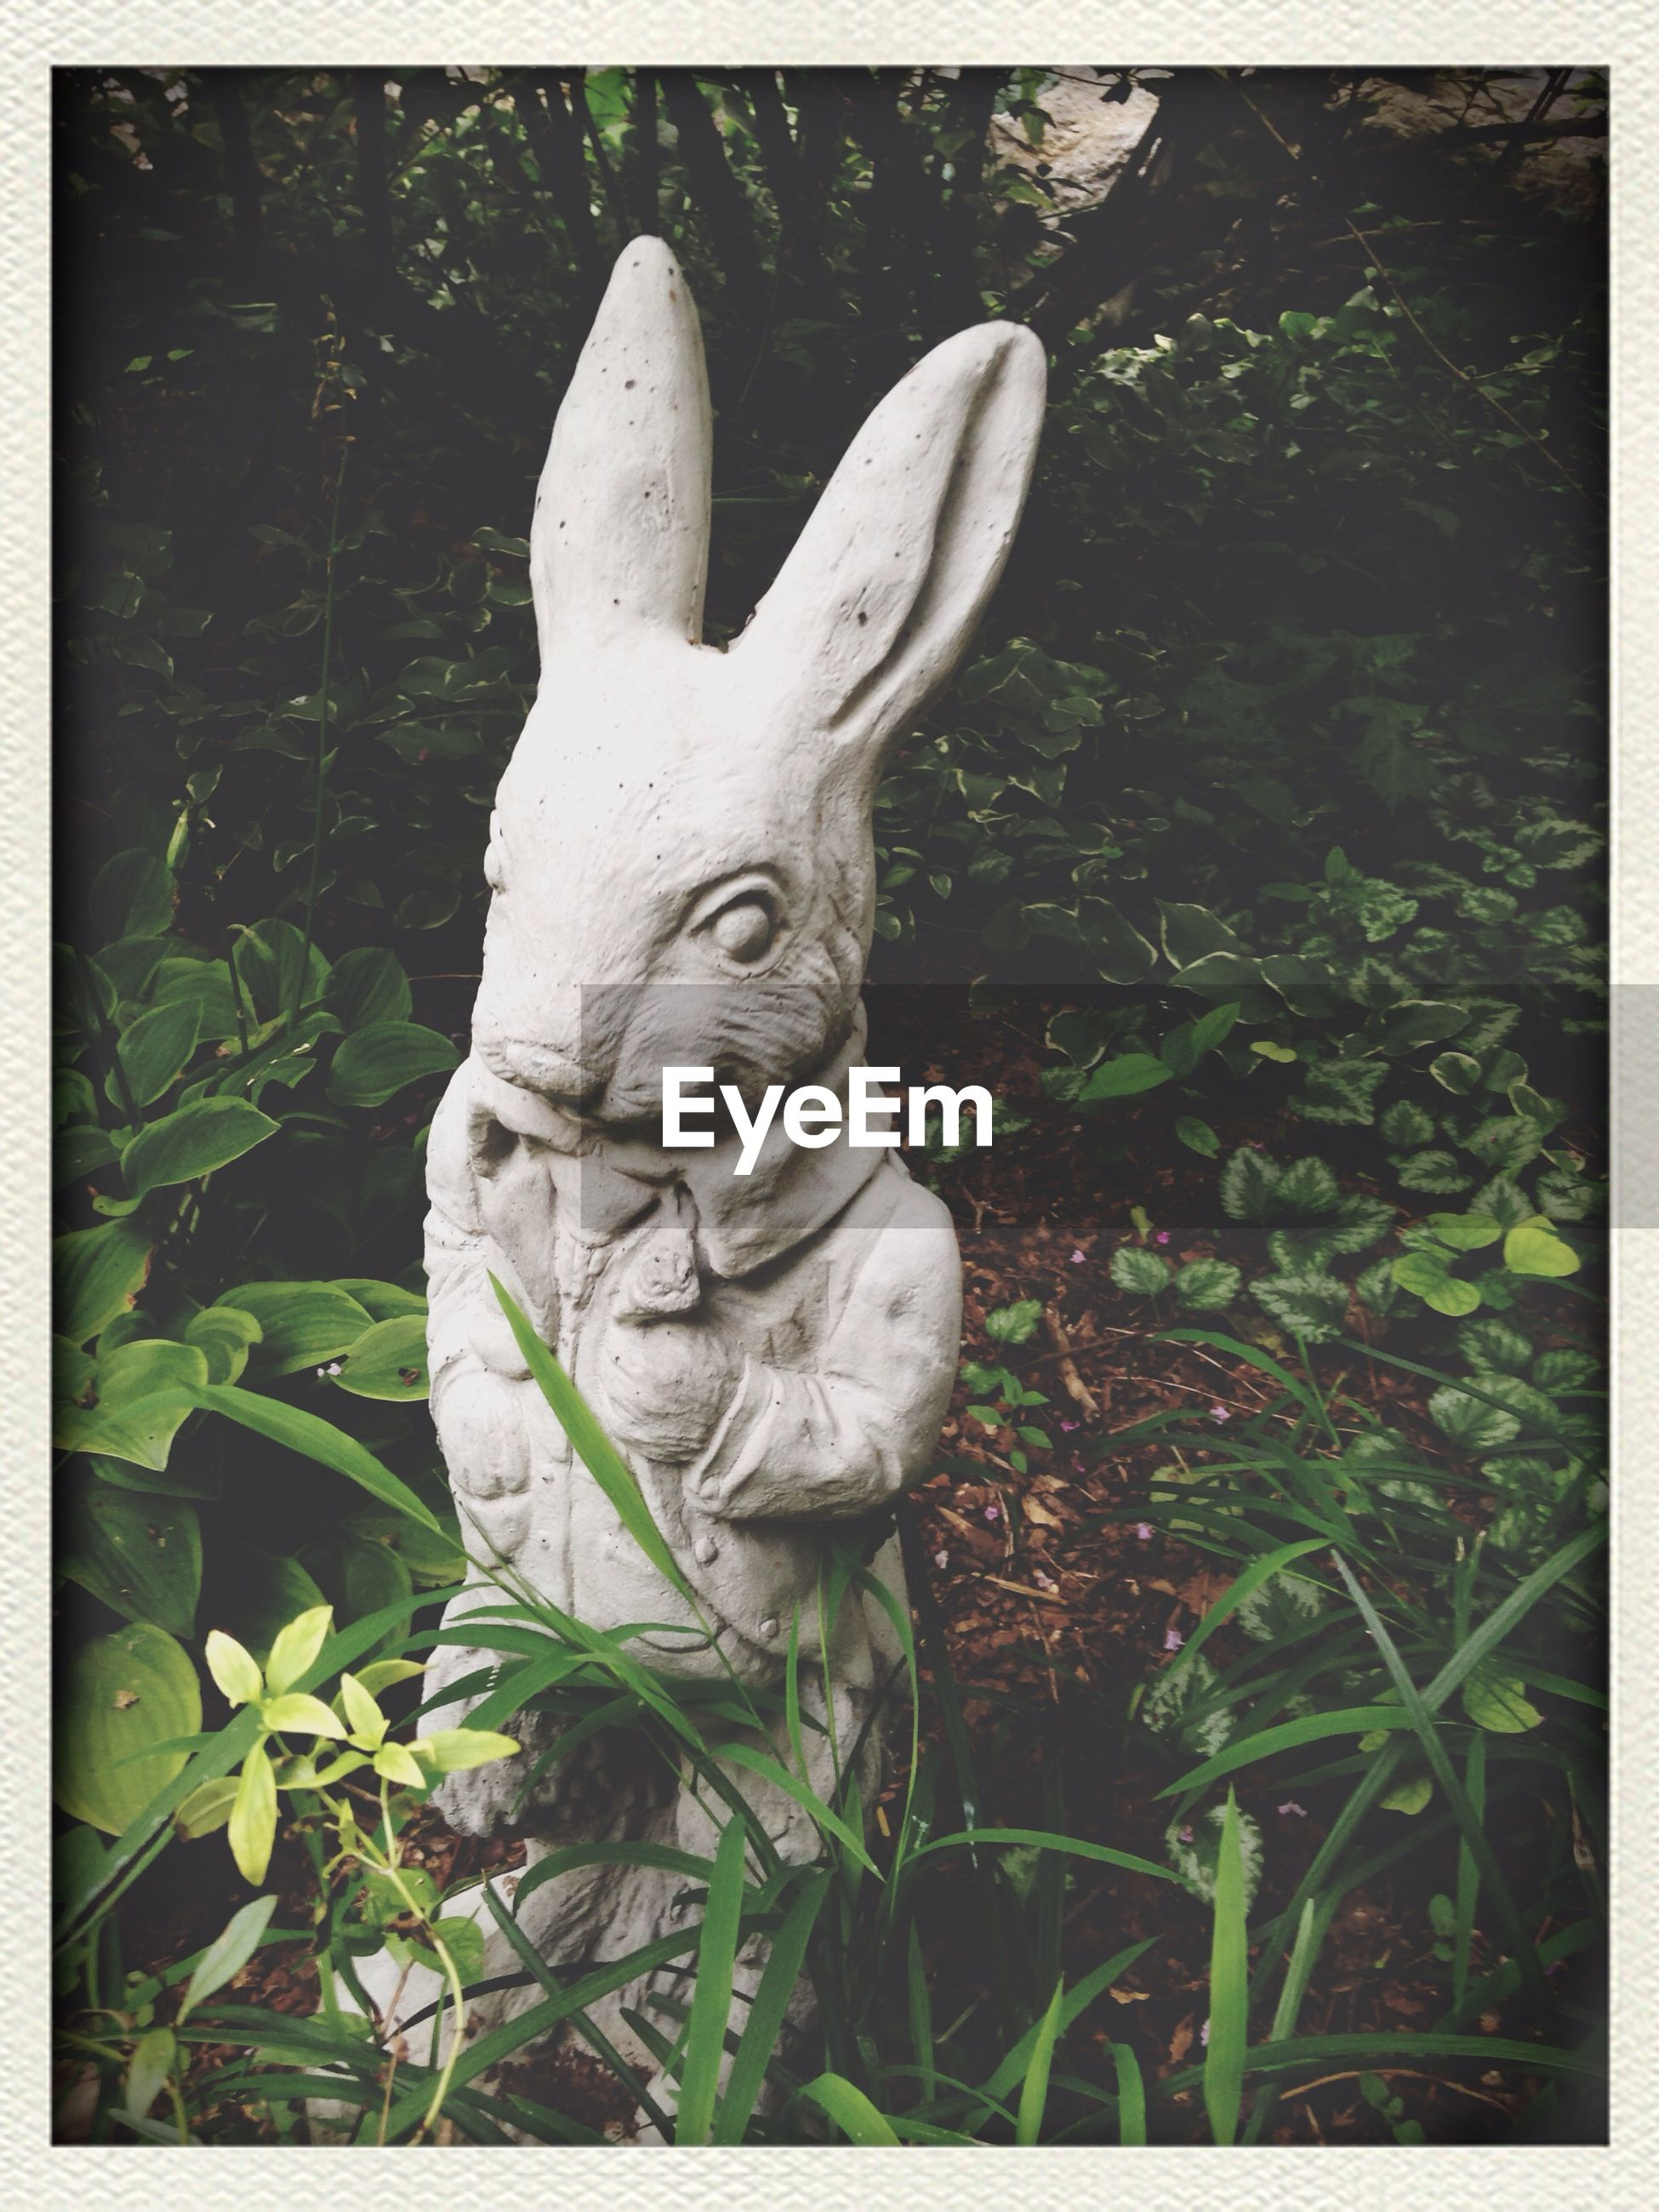 I'm late! Alice In Wonderland Rabbit Bunny Fantasy - EyeEm - 웹